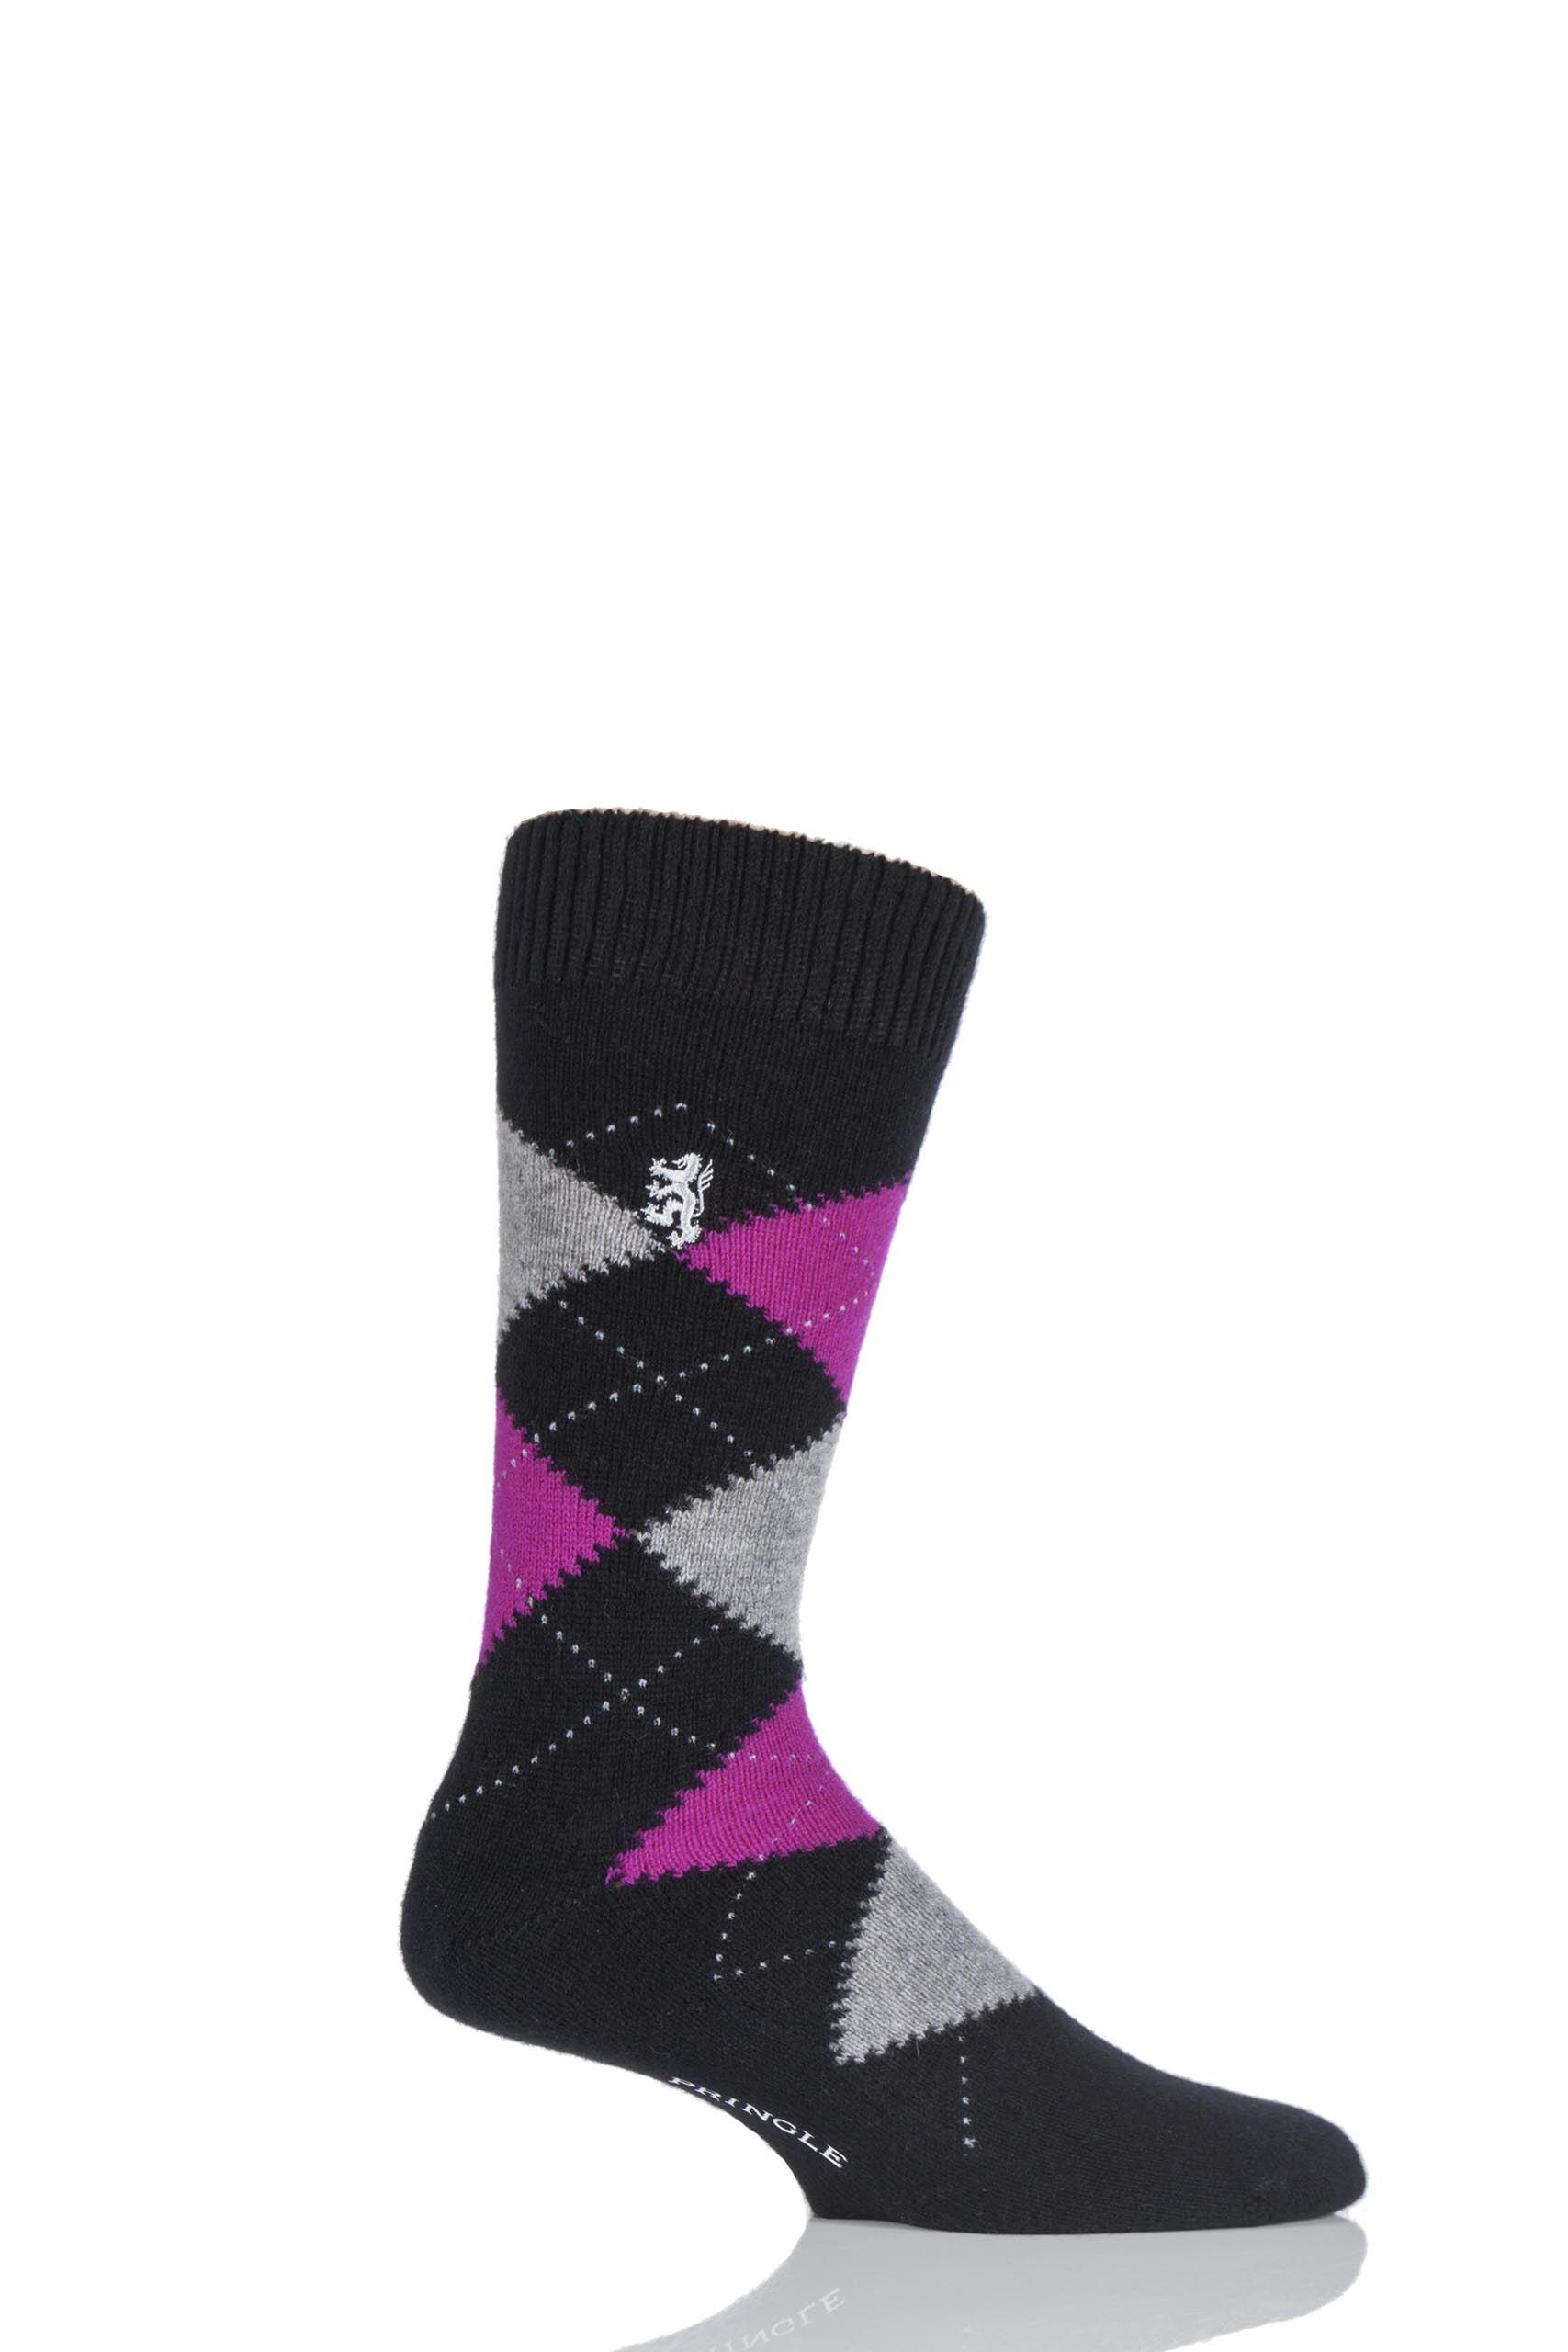 Image of 1 Pair Black 85% Cashmere Argyle Socks Men's 6-8.5 Mens - Pringle of Scotland